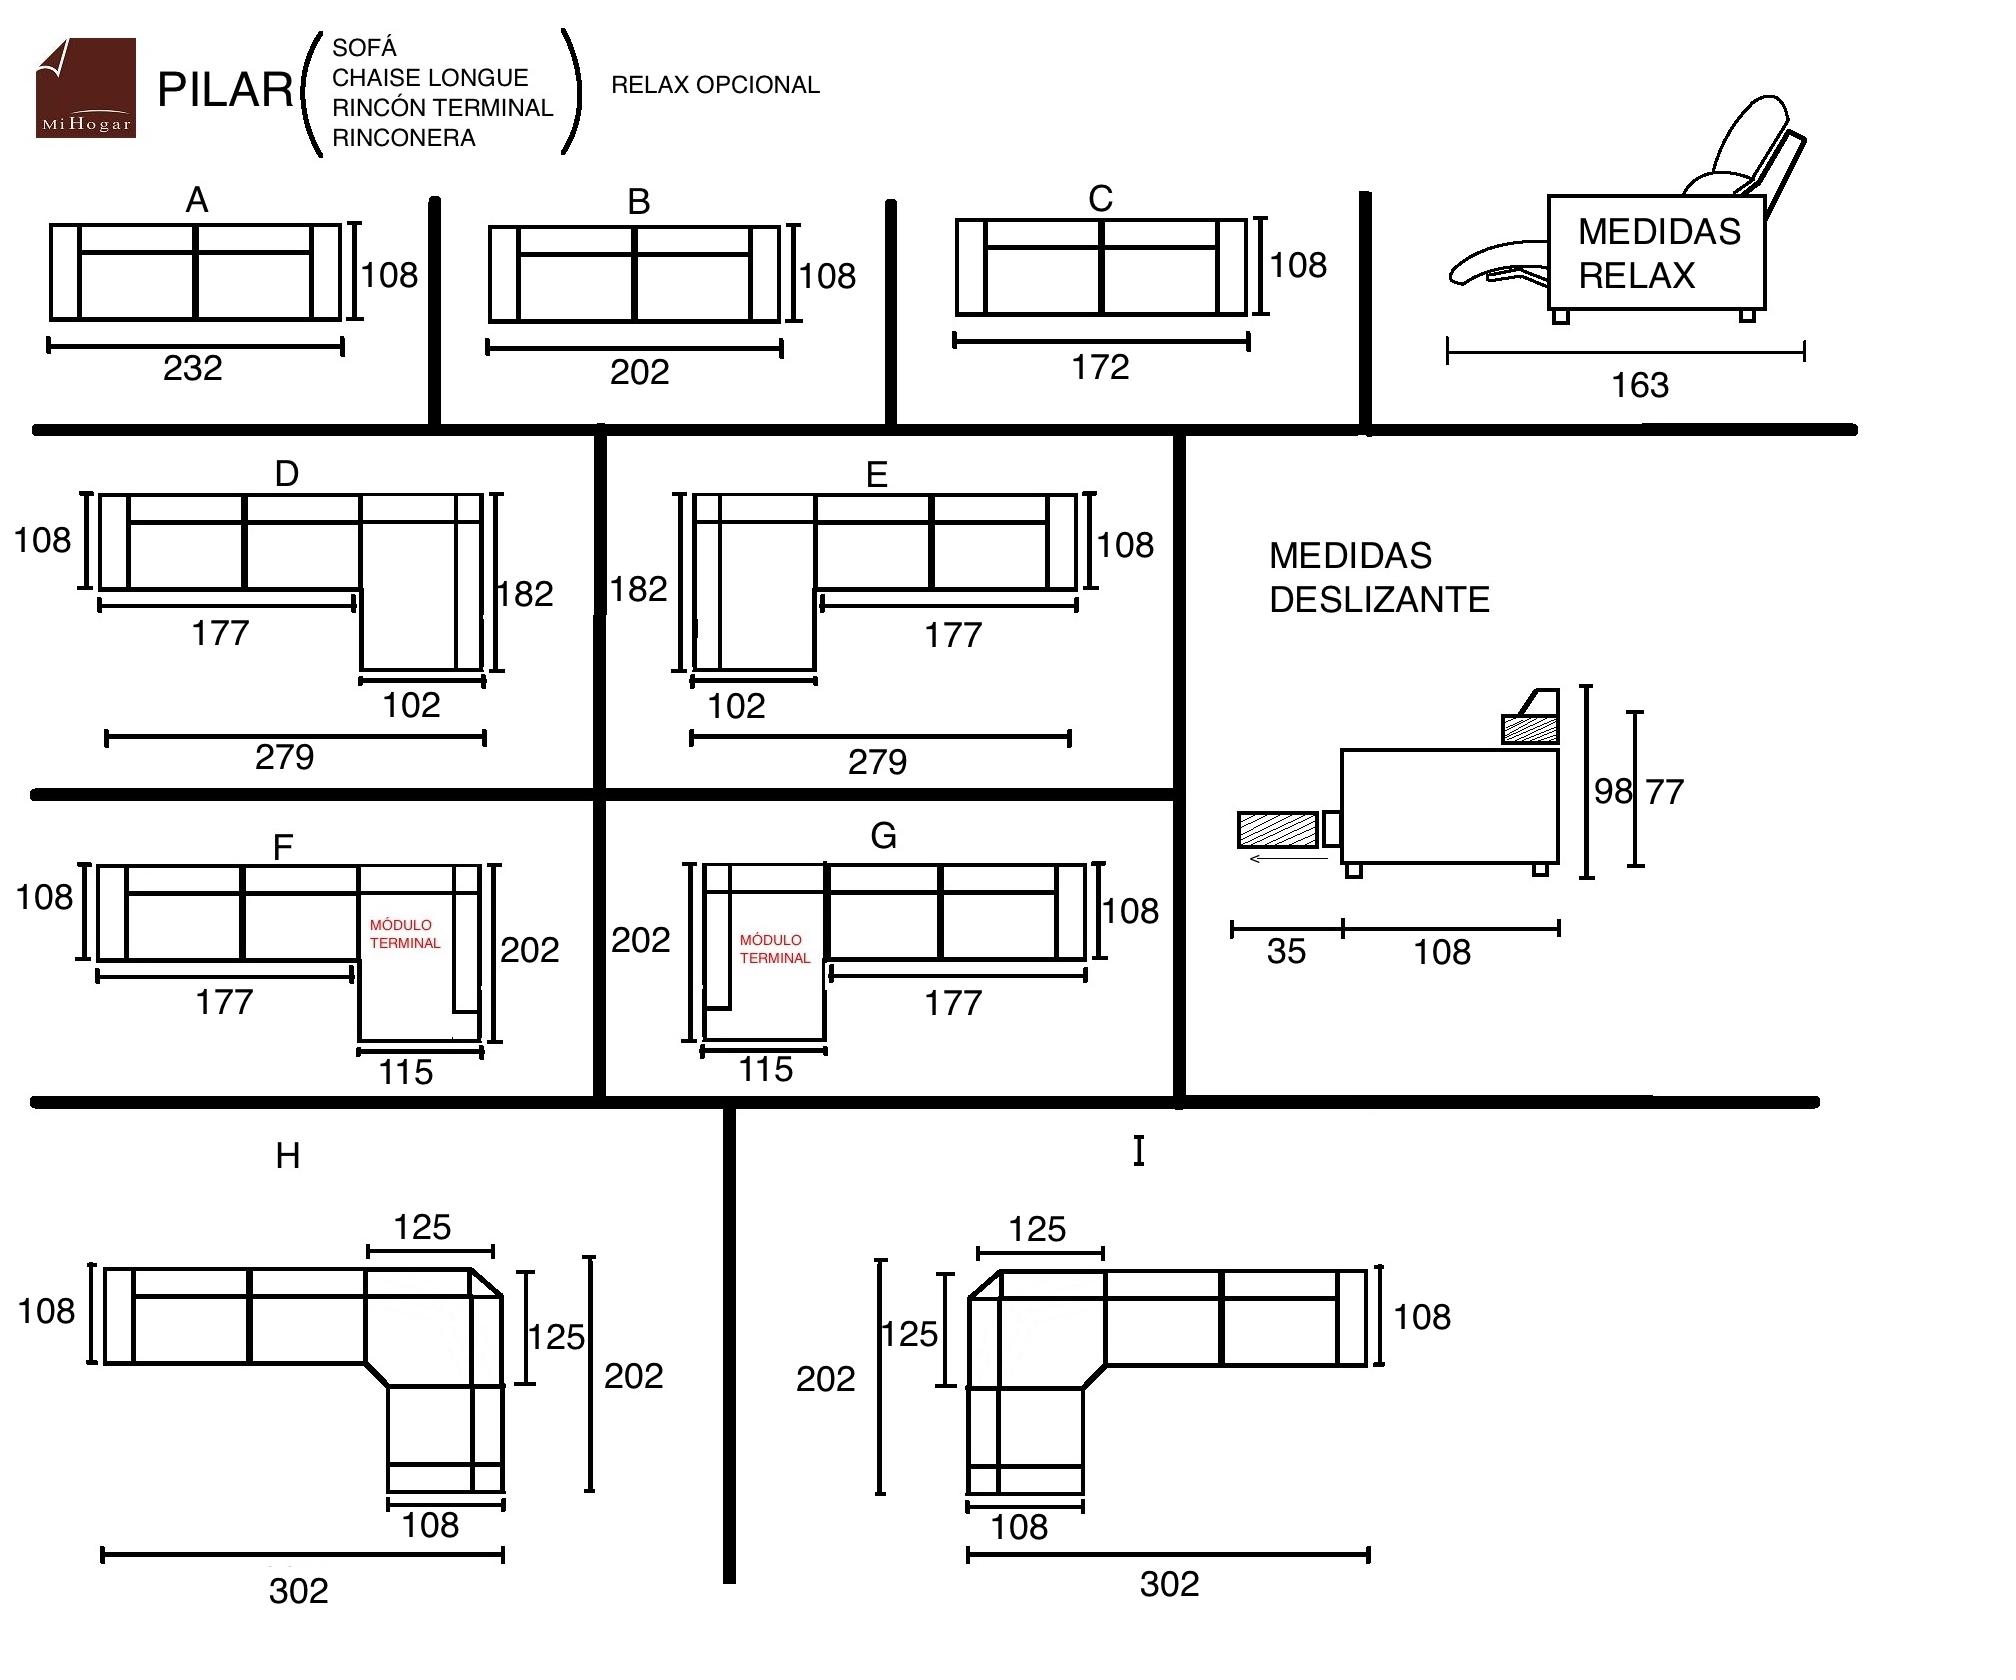 Chaise longue sof rinconera relax pilar muebles for Chaise longue medidas